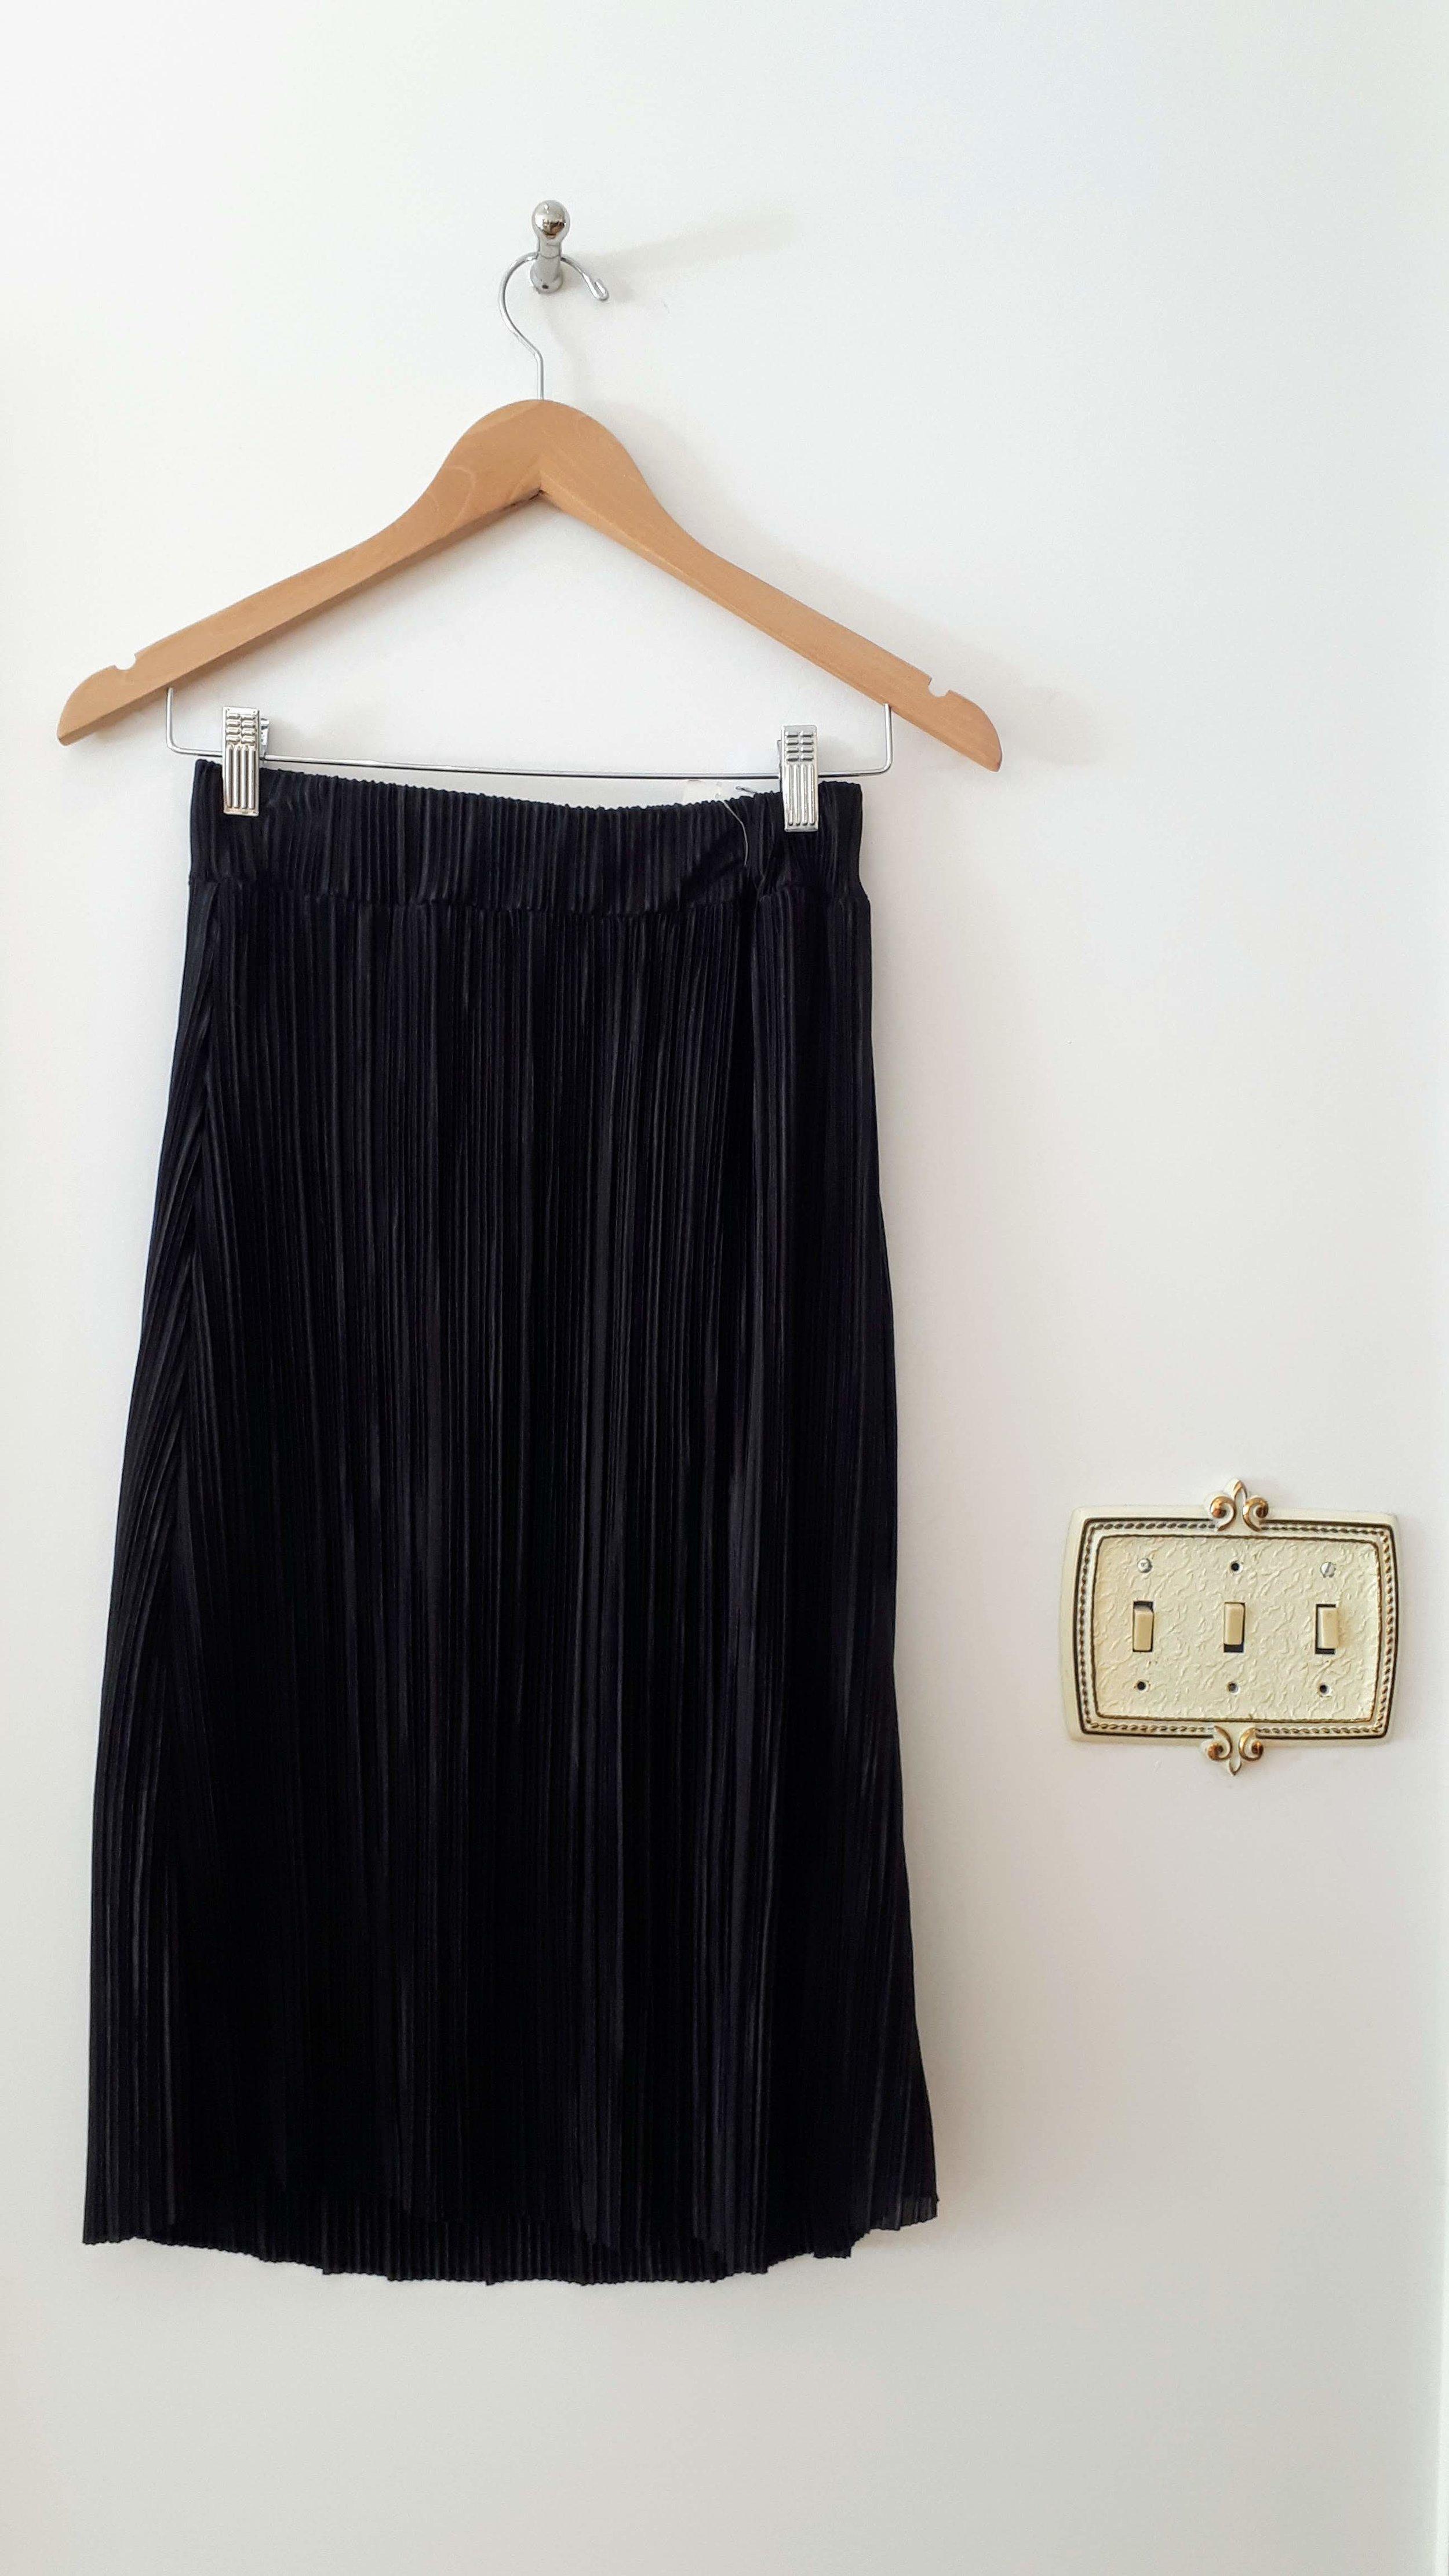 Workhall skirt; Size S, $36